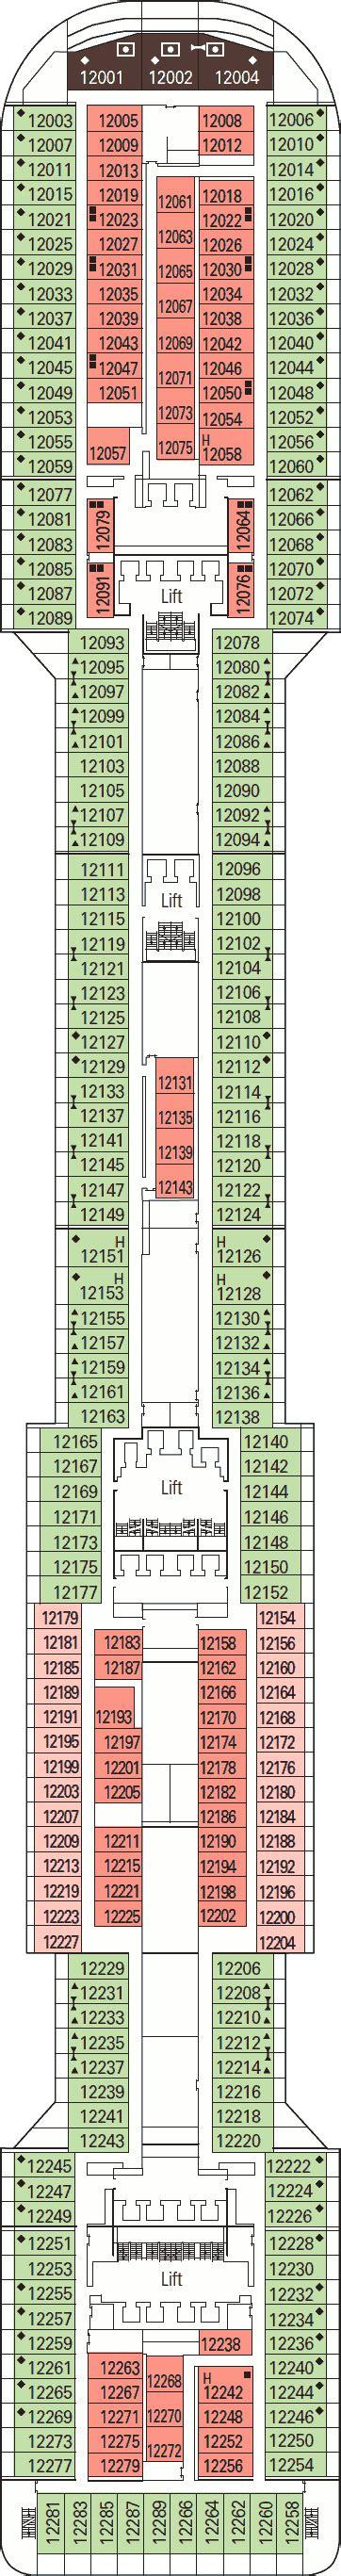 Msc Divina Deck Plan 12 by Msc Divina Deck Plans